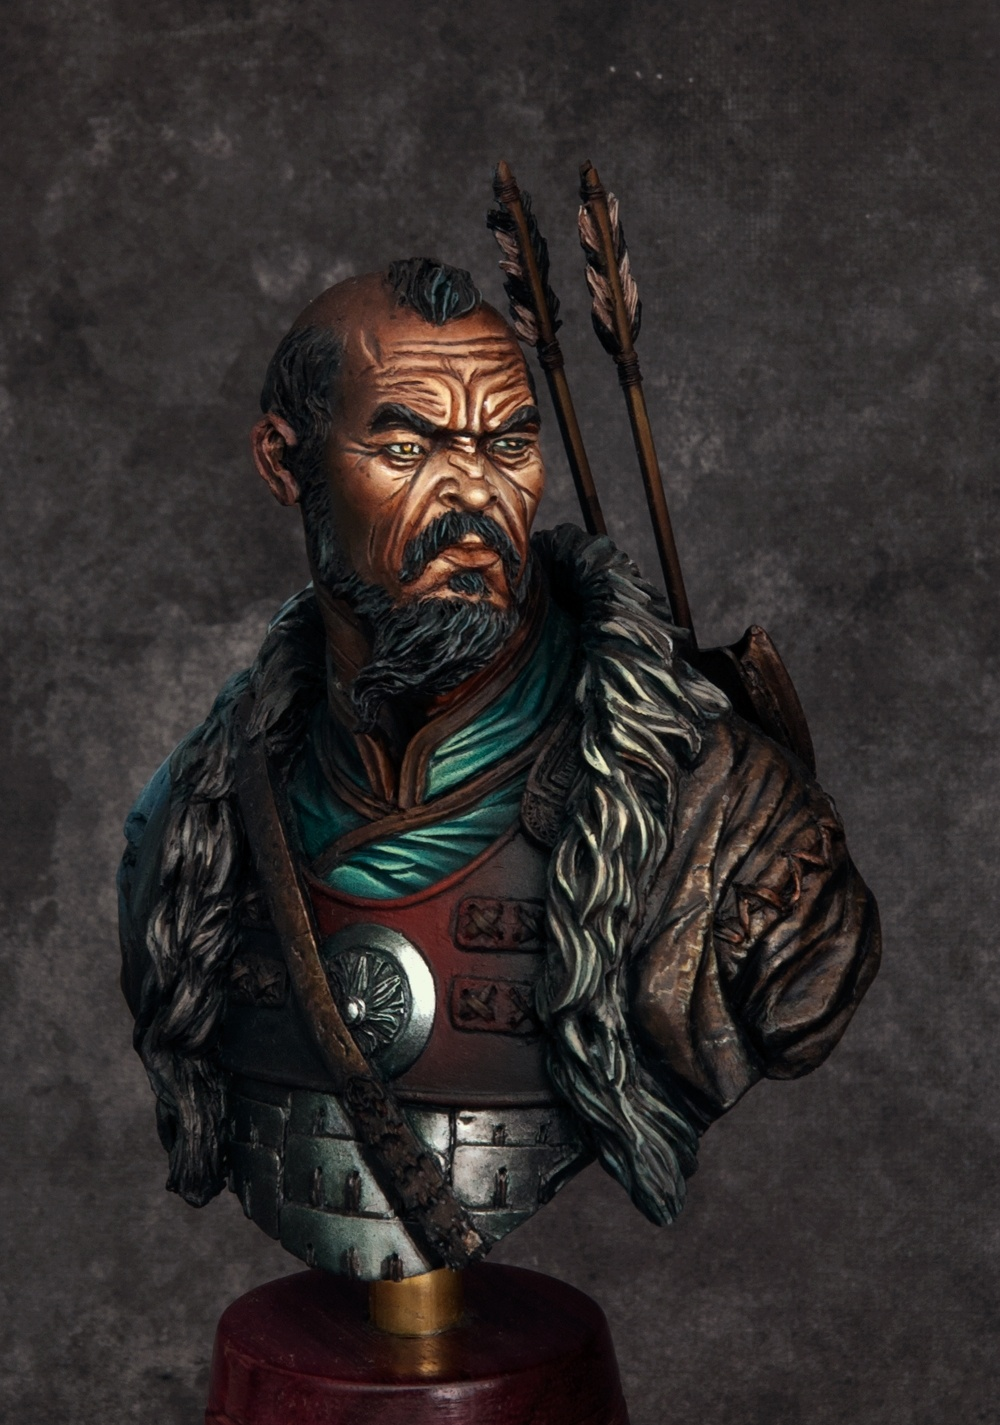 Bright Colors Wallpaper 3d Mongol Warrior By John Quot Darkmessiah Quot Harrison 183 Putty Amp Paint